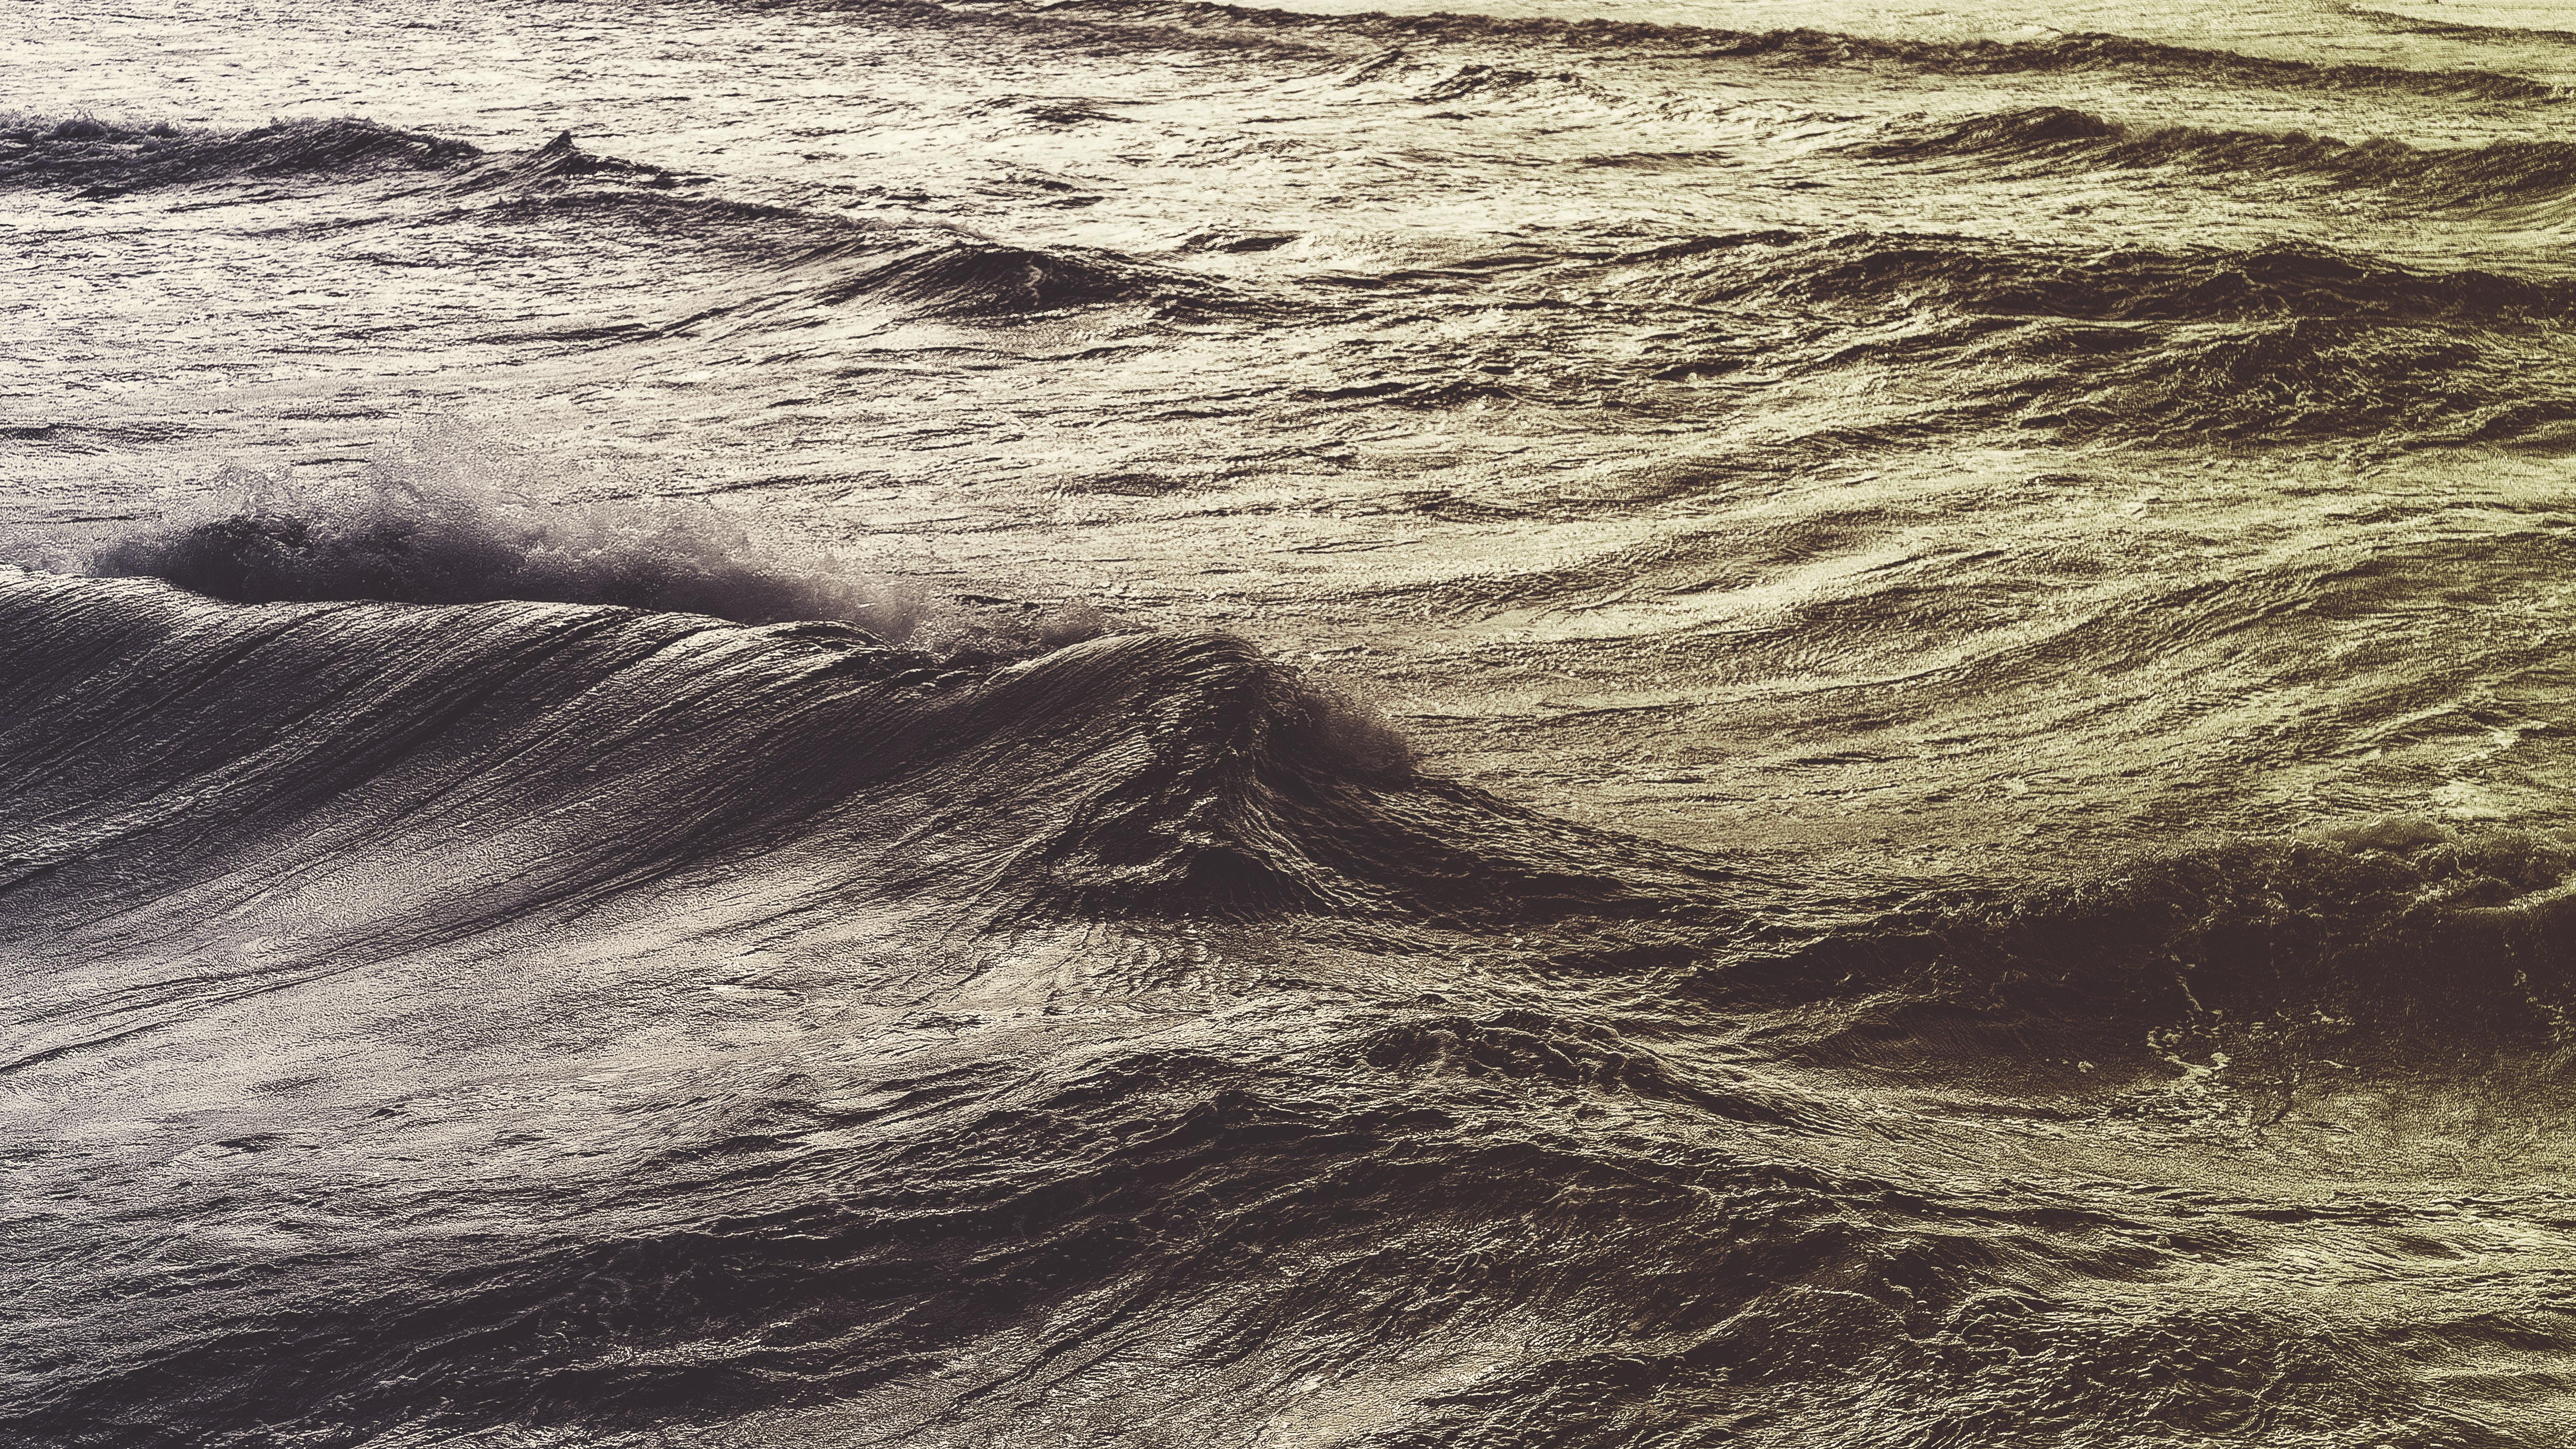 Ocean waves rippling at Glenelg Beach